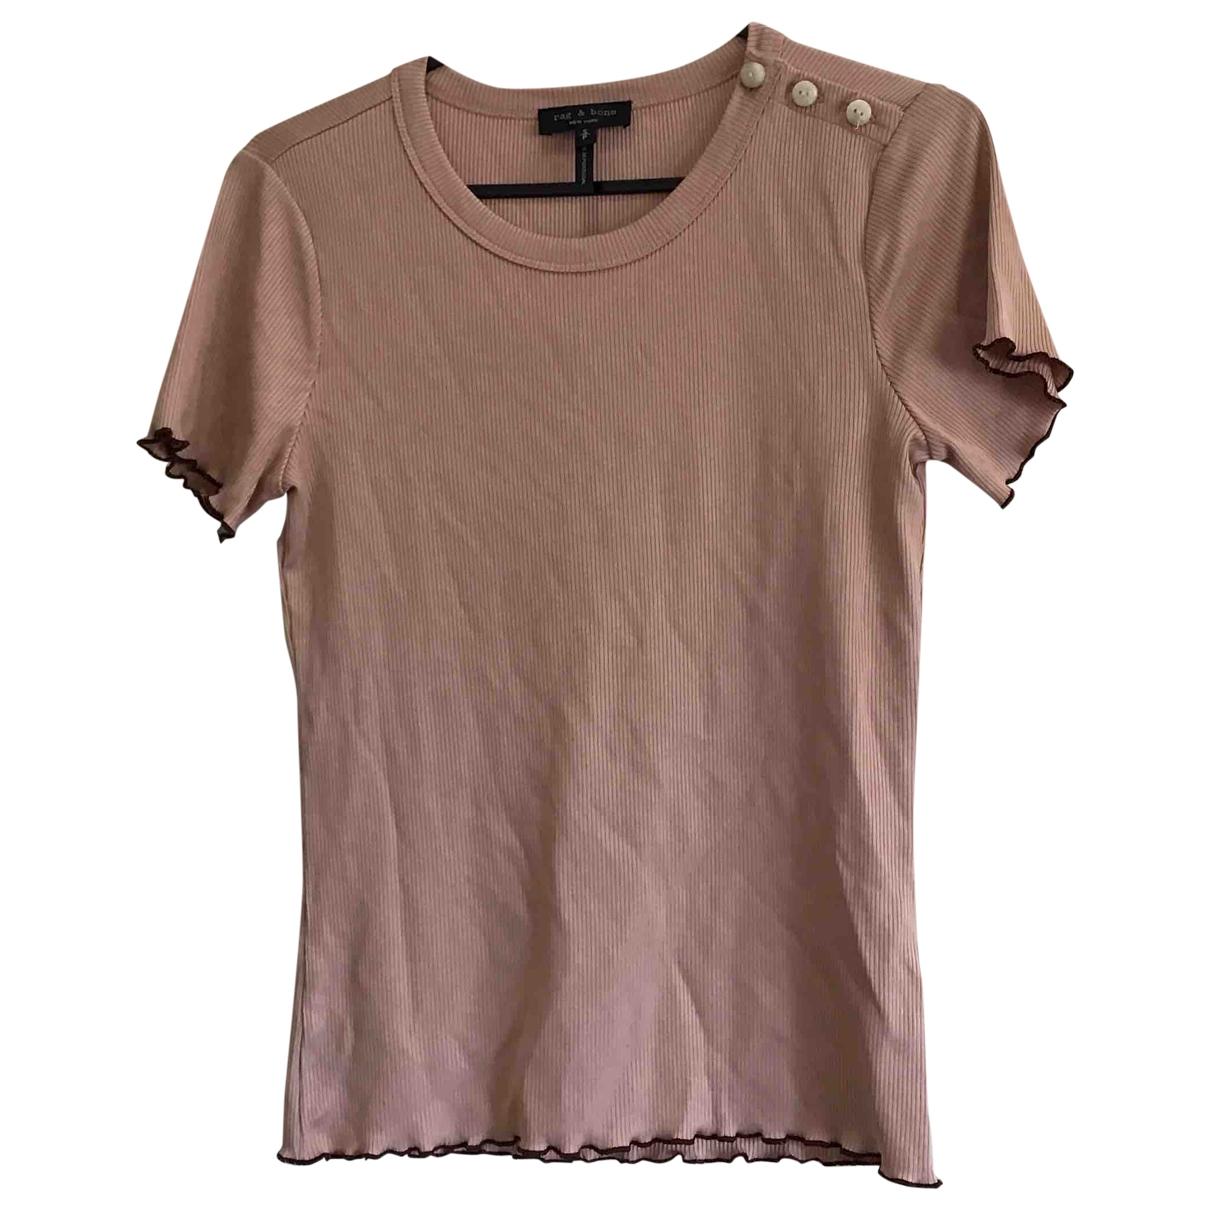 Rag & Bone \N Pink  top for Women S International